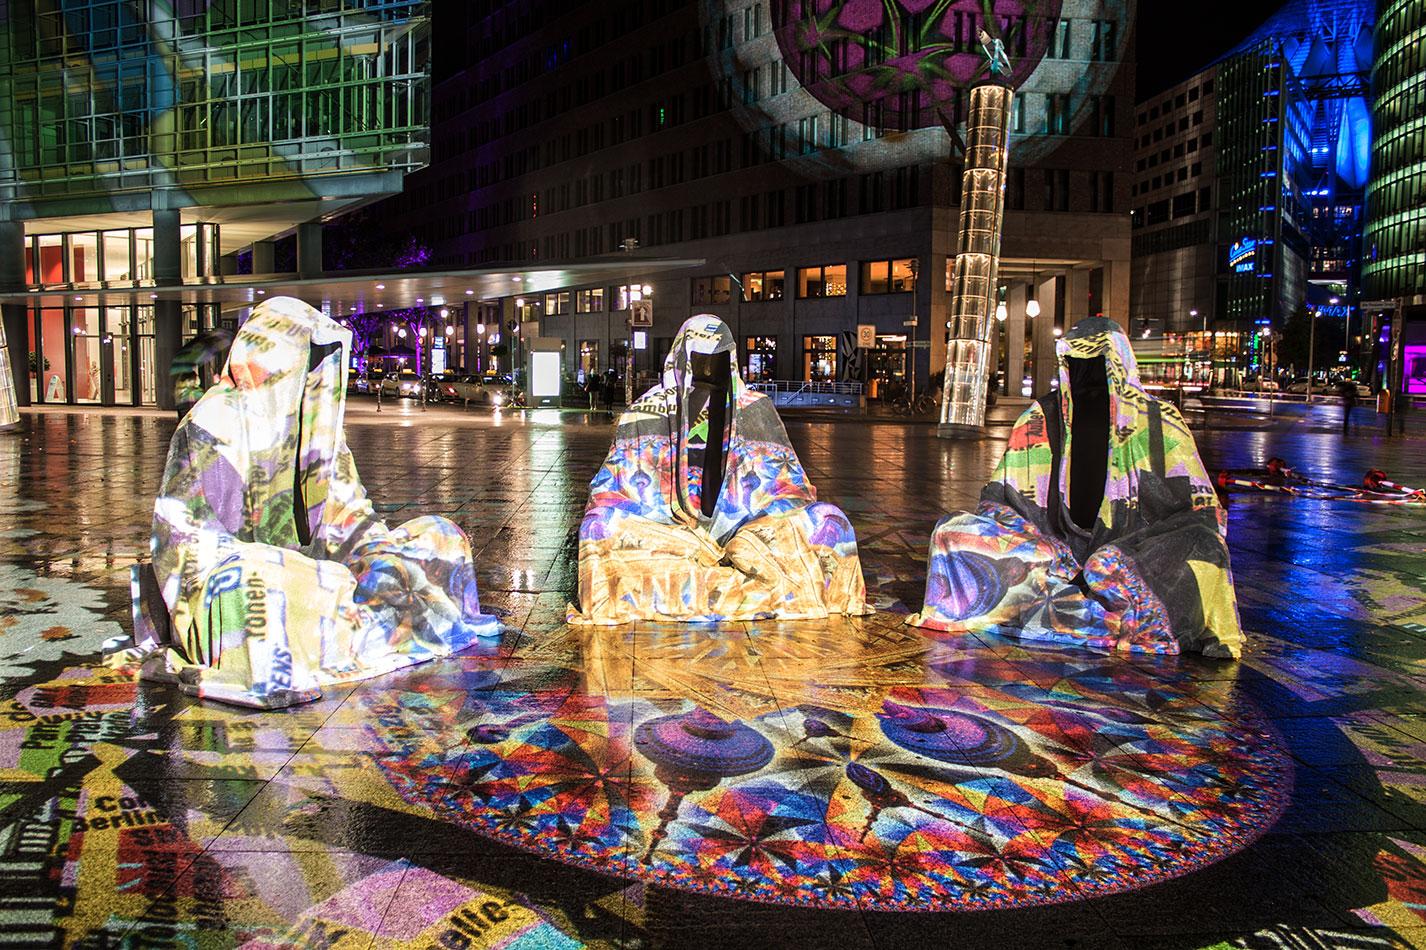 festival-of-lights-berlin-light-art-festival-contemporary-fine-art-design-show-large-scale-sculpture-guardiansof-time-manfred-kili-kielnhofer-sculpture-3866